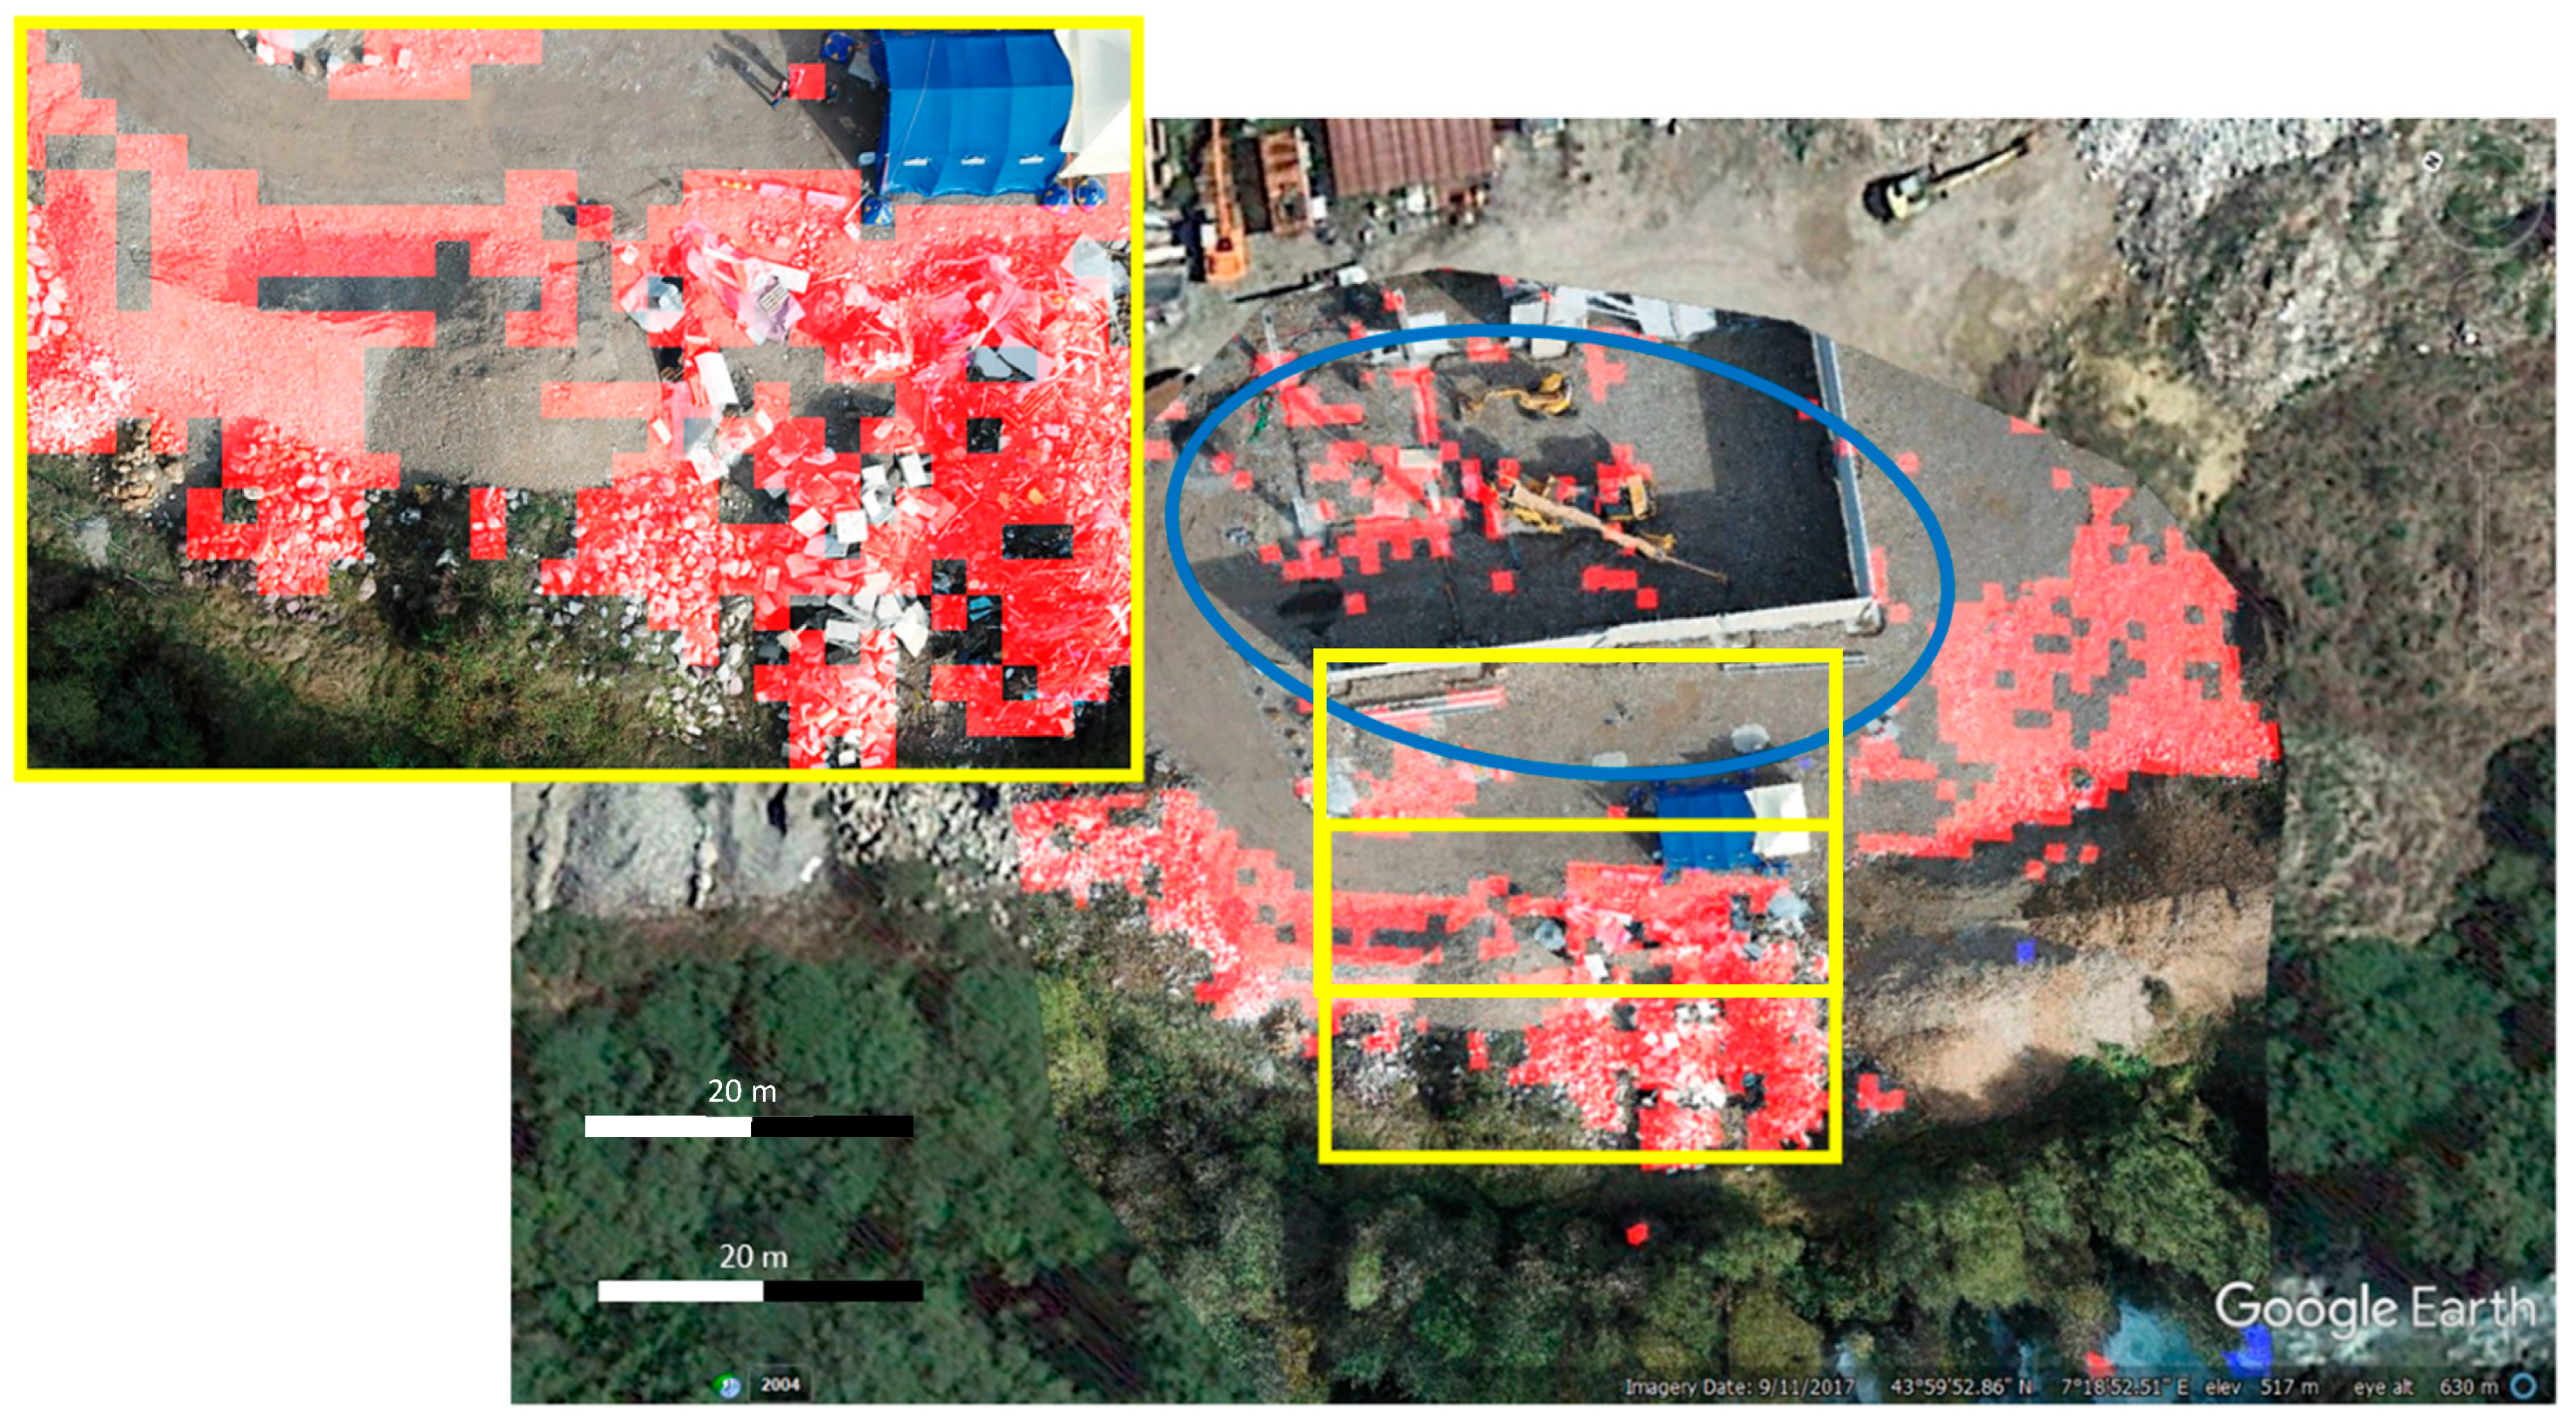 Alt Binaries Global Quake Free remote sensing | free full-text | towards real-time building